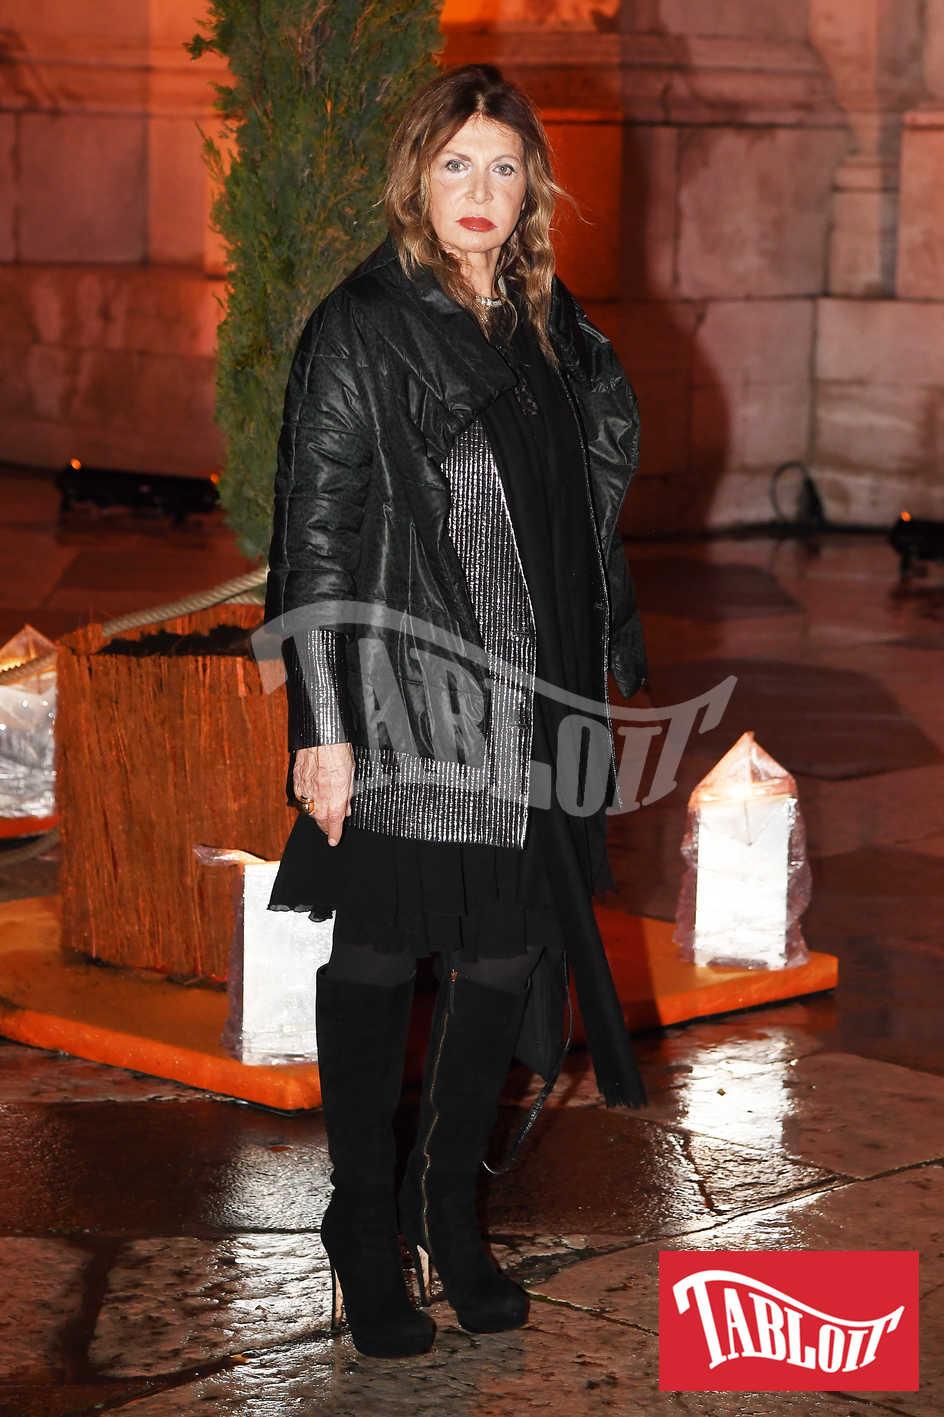 Maria Luisa Trussardi, mamma di Tomaso Trussardi e suocera di Michelle Hunziker a venezia